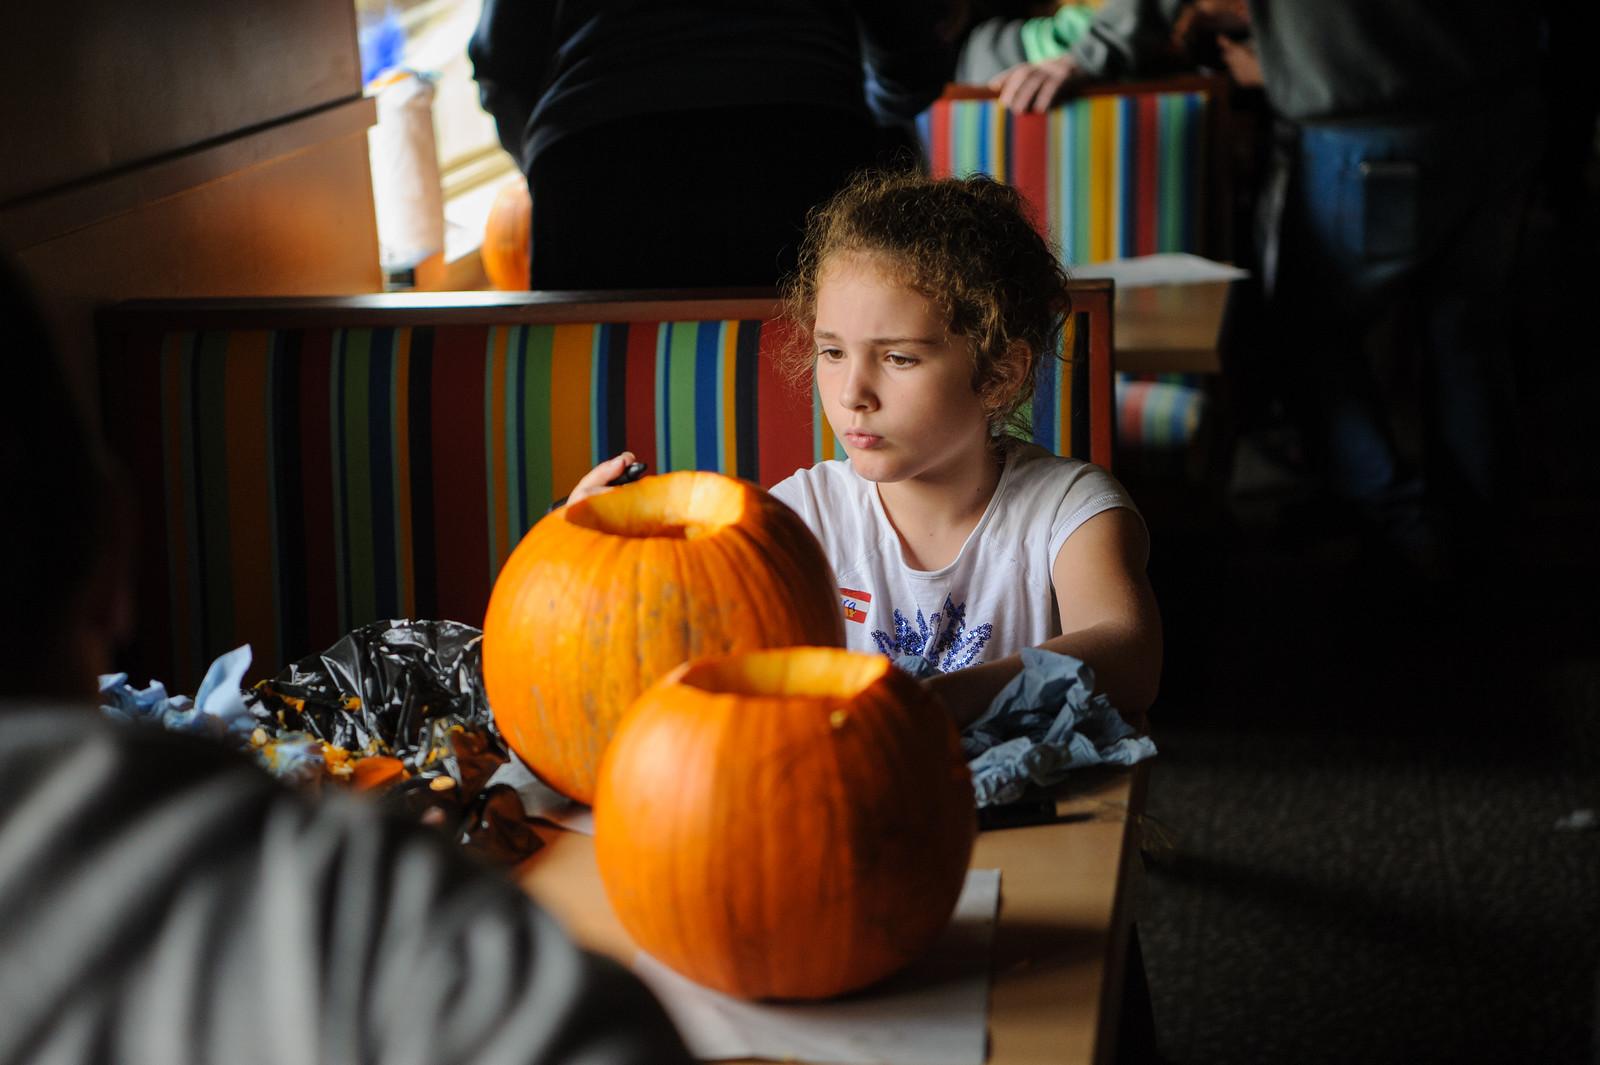 31 Days of Halloween 2021 at Tattershall Lakes